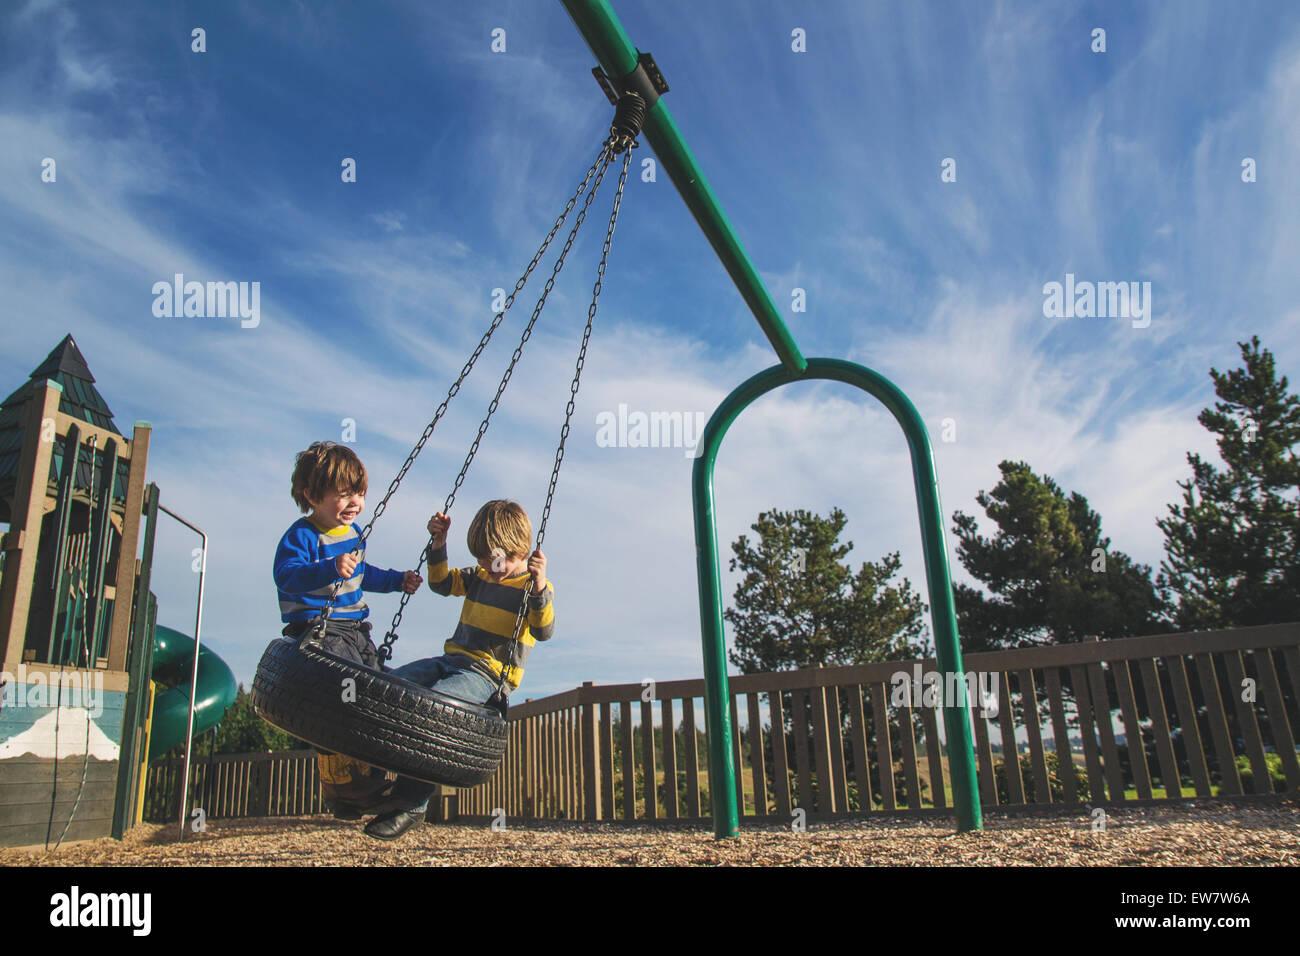 Dos muchachos balanceándose en un columpio de neumático en un parque Imagen De Stock